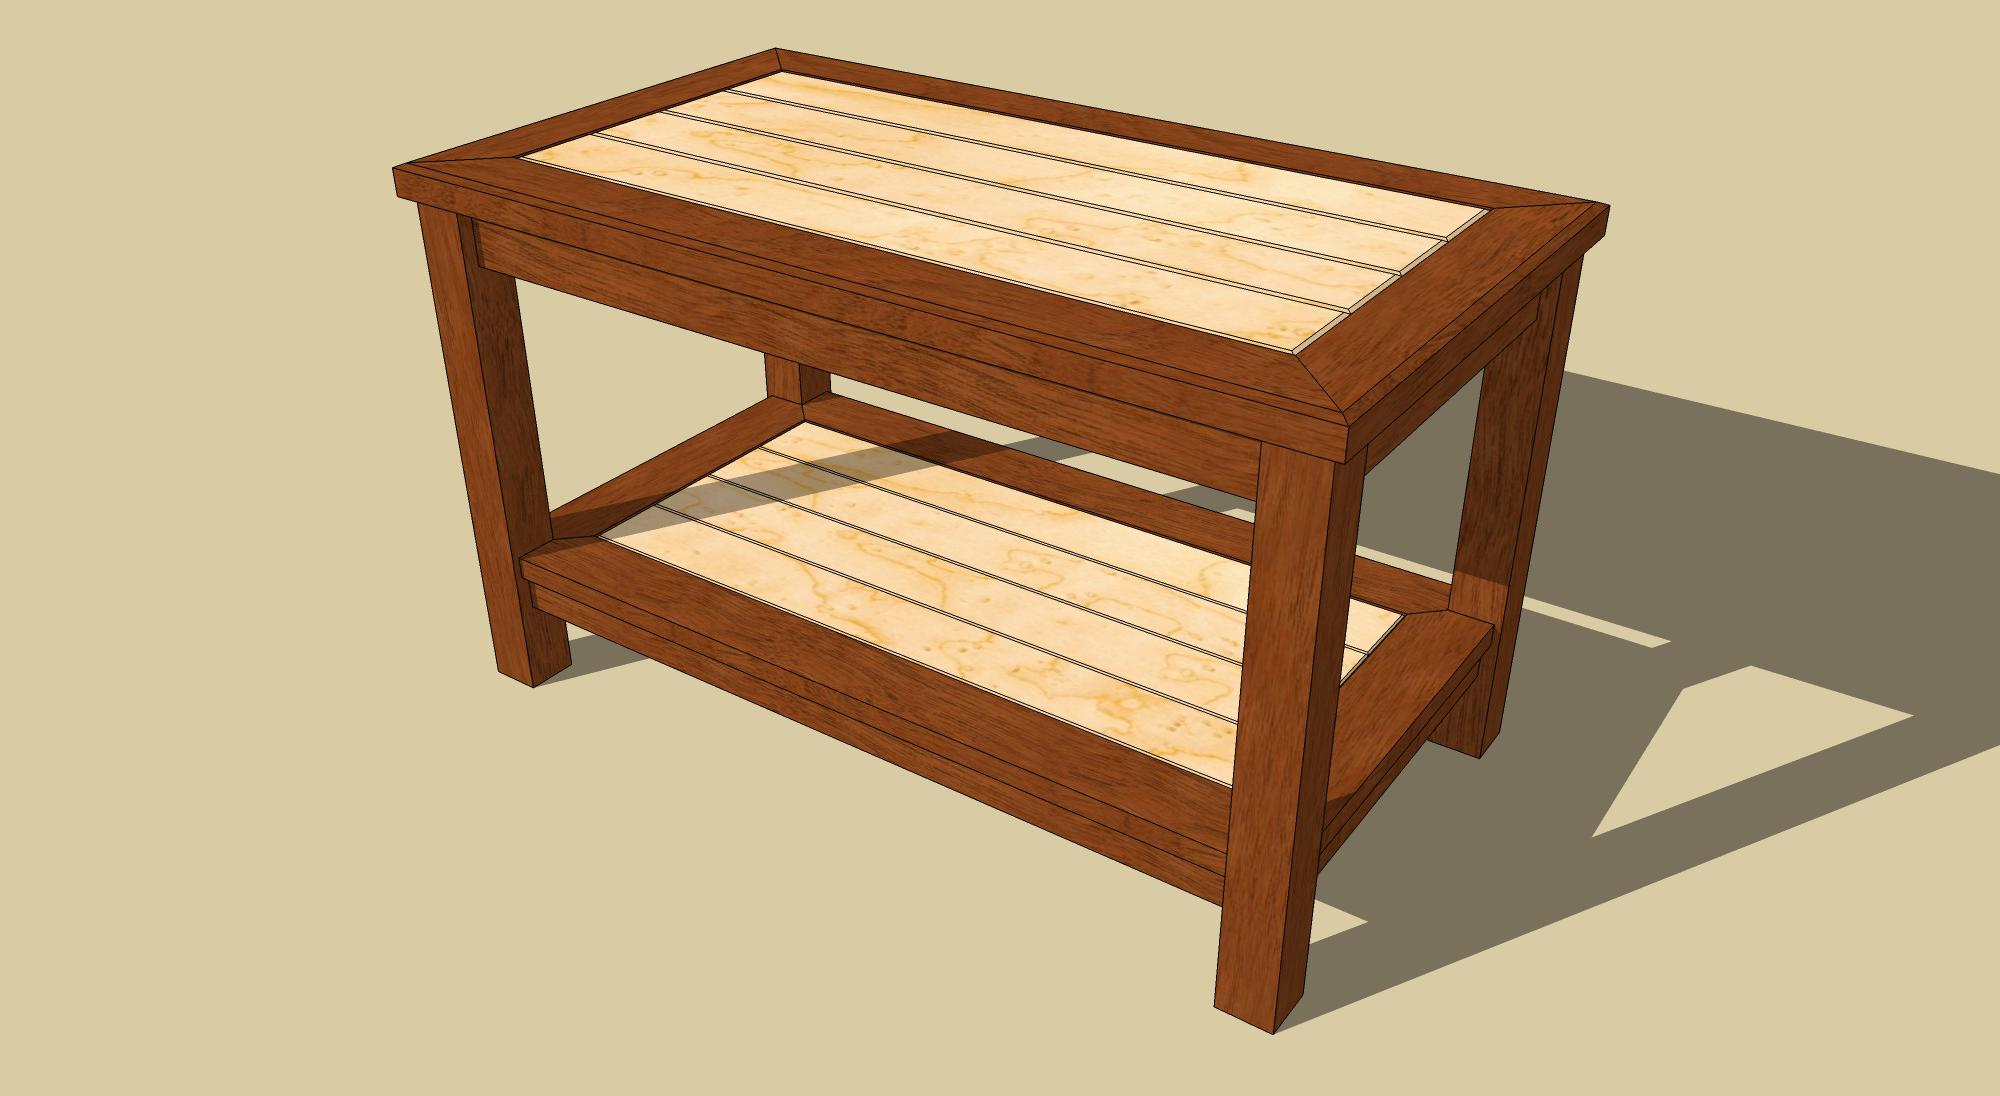 furniture blueprints shaker coffee table plans pre built. Black Bedroom Furniture Sets. Home Design Ideas